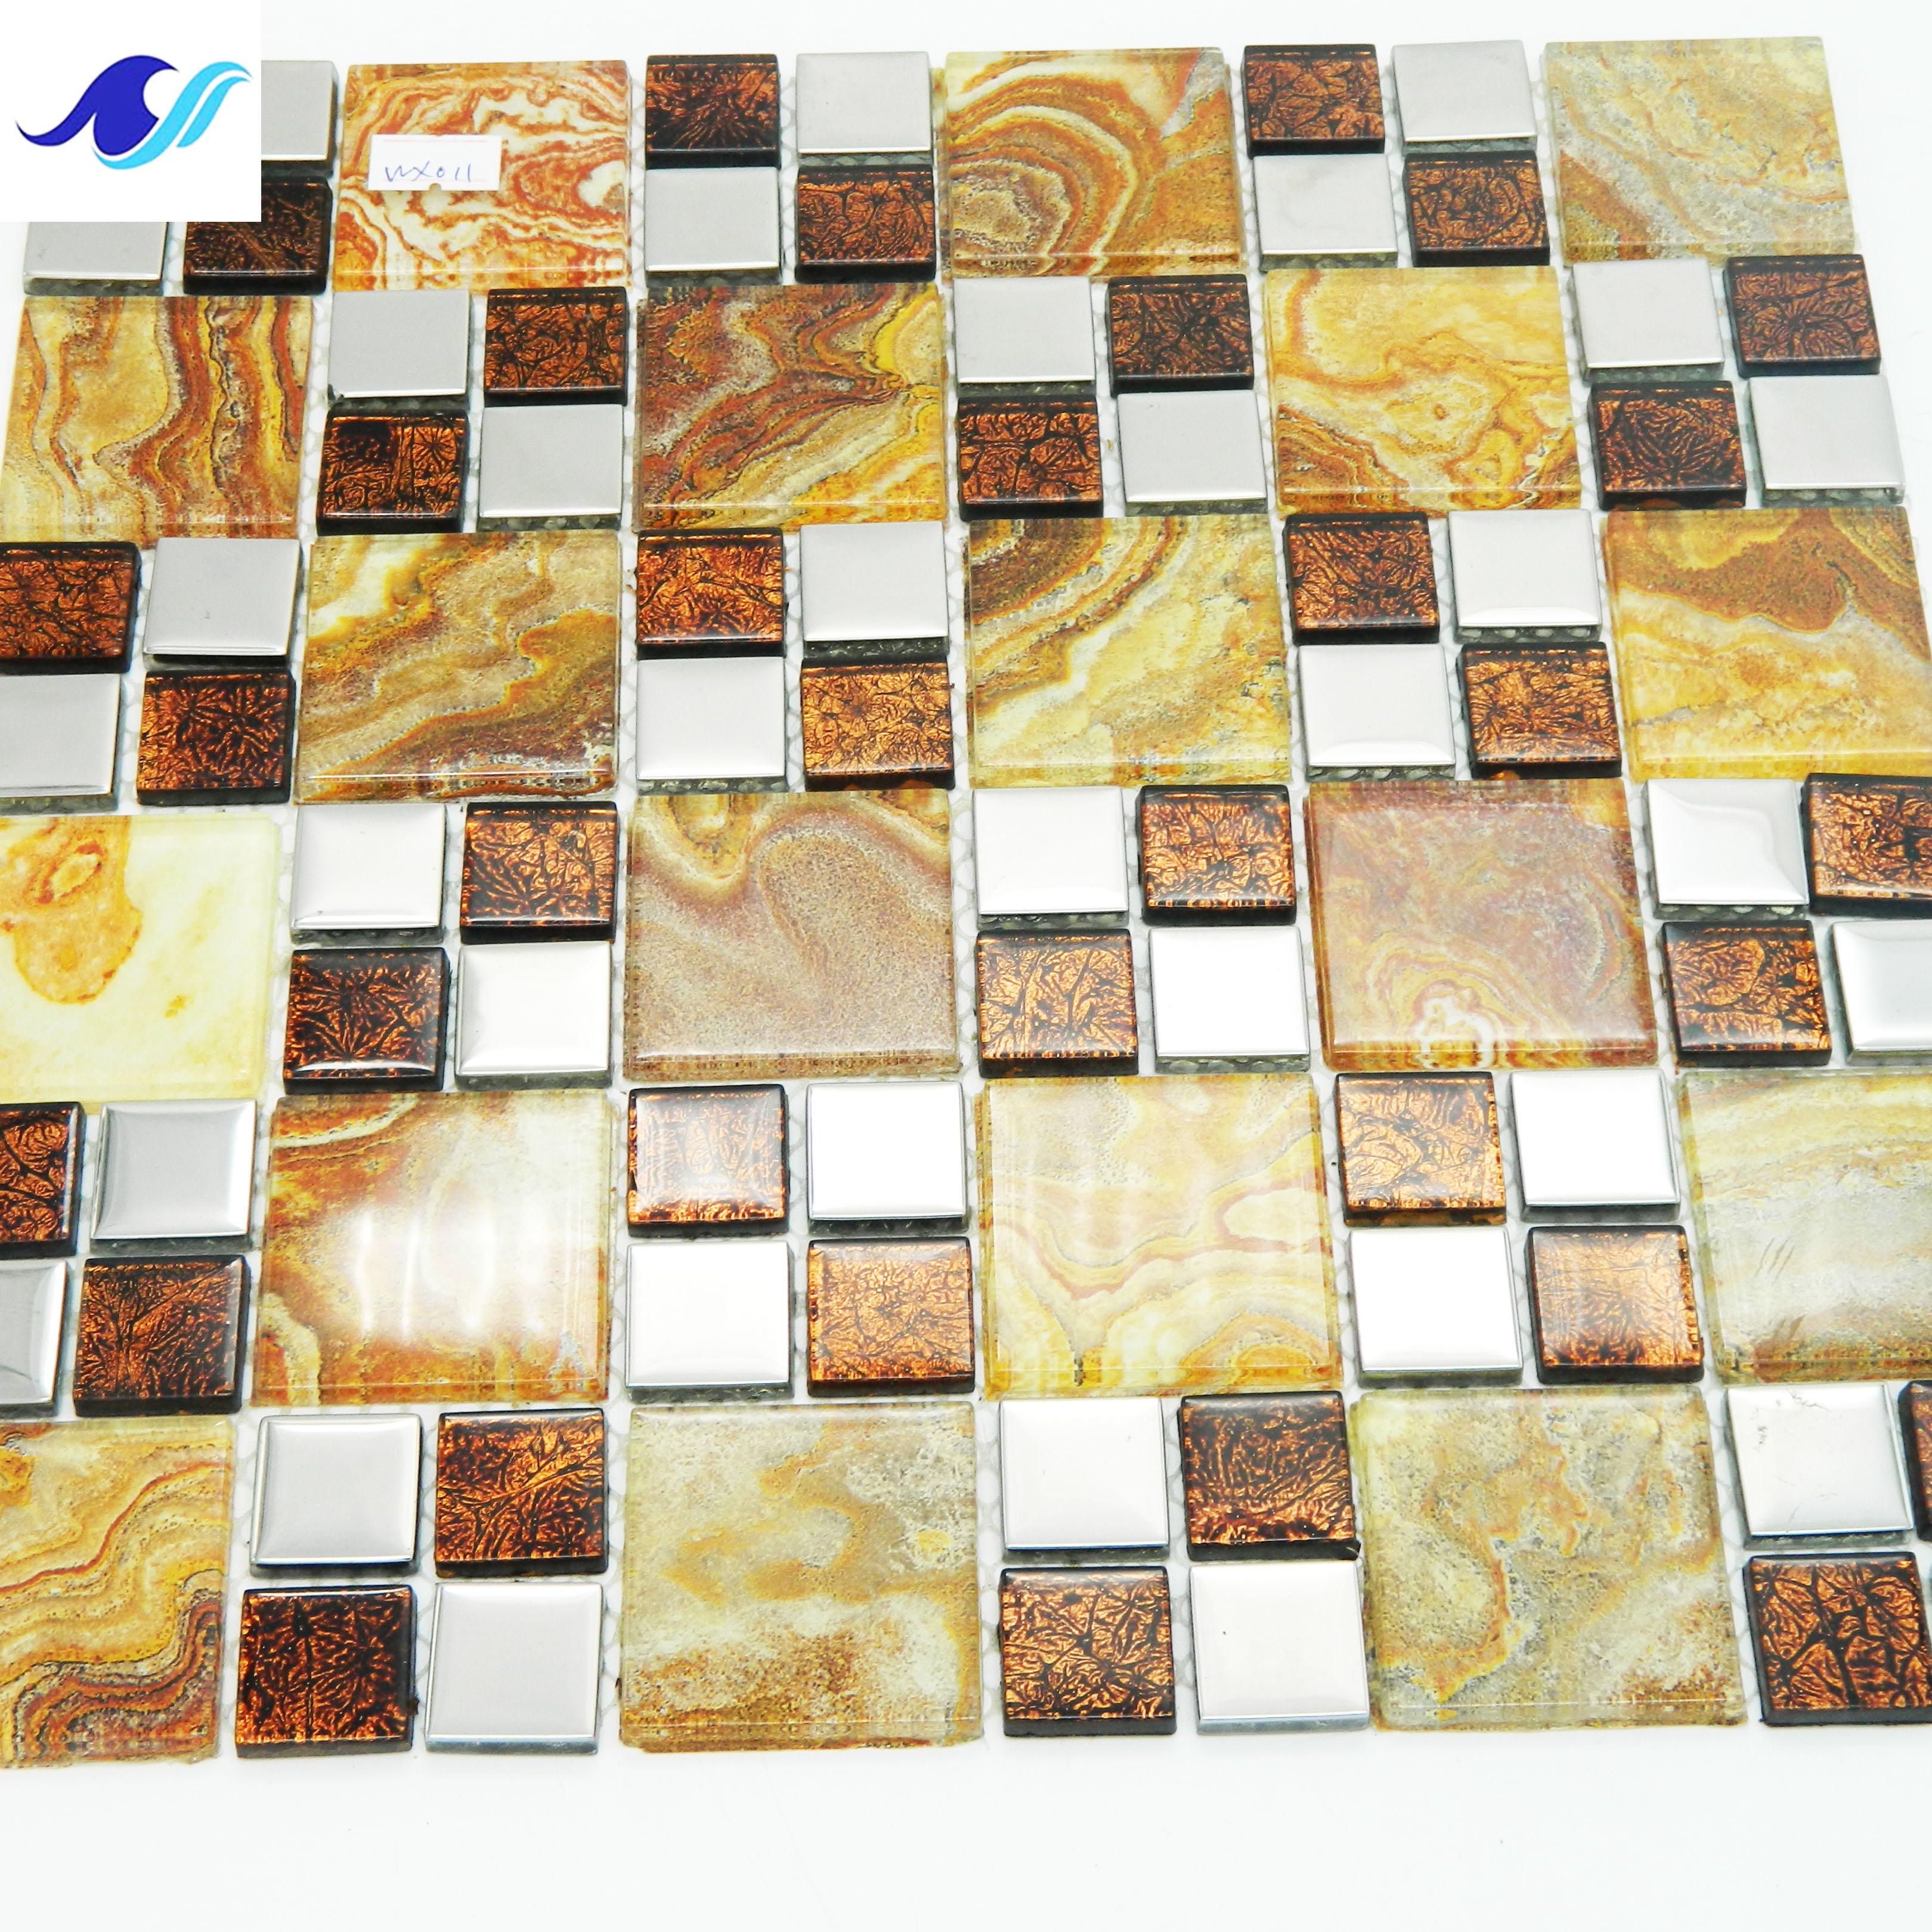 Art Decor Tile 300*300 Wholesale, Tile 300*300 Suppliers - Alibaba